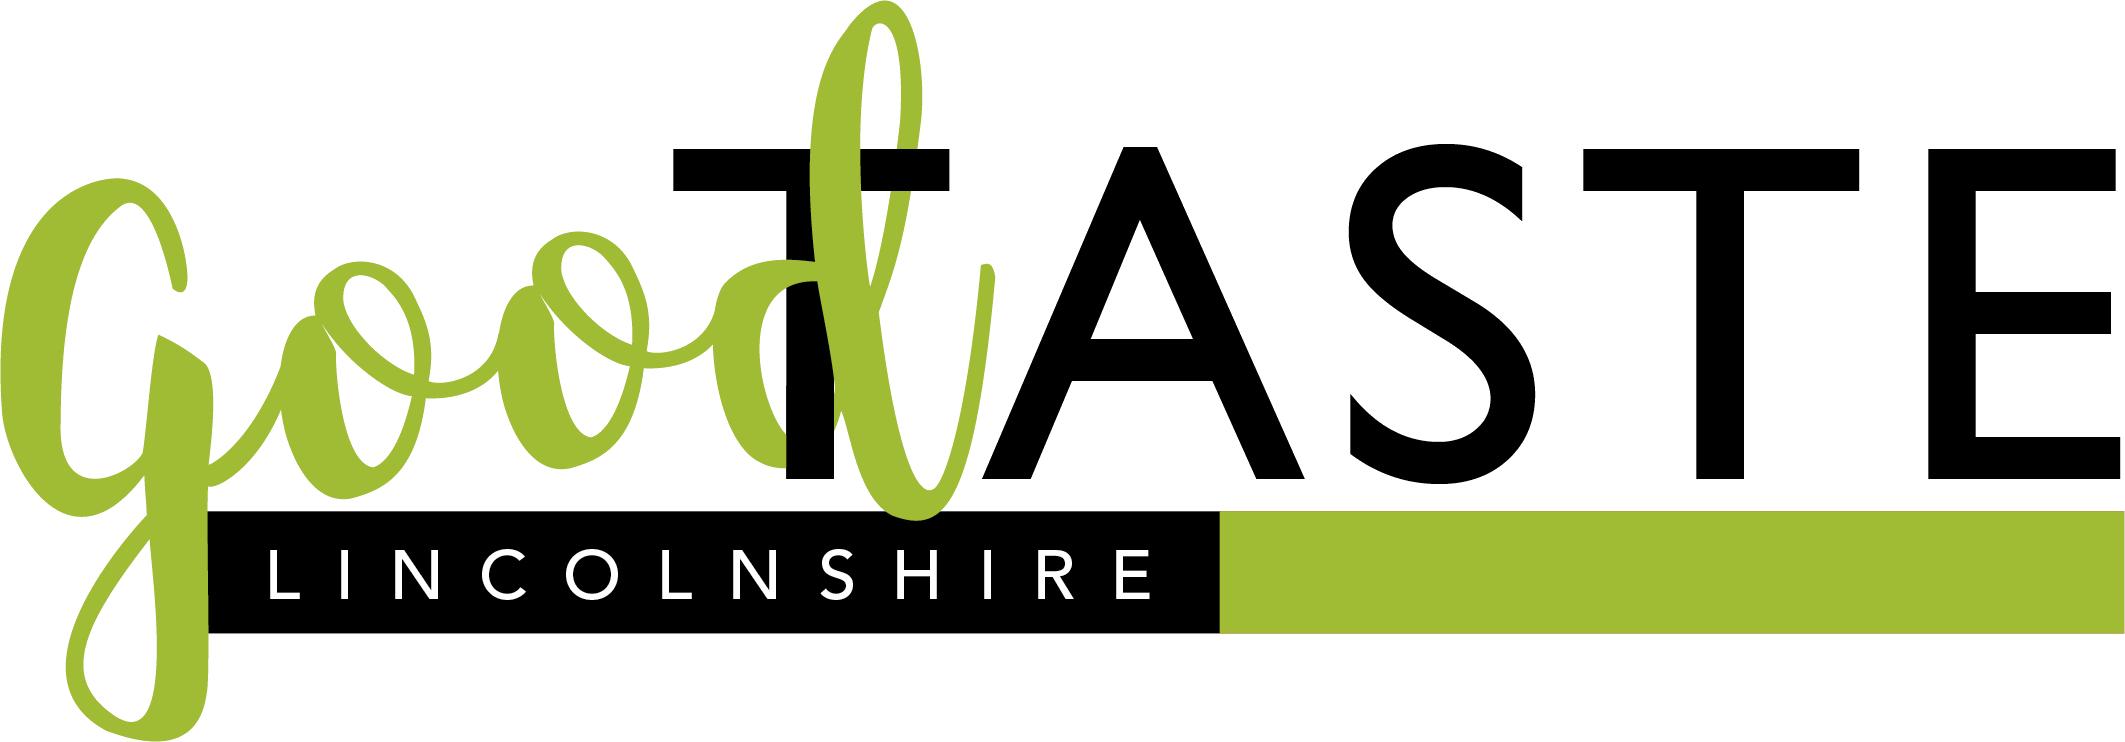 Publications logo